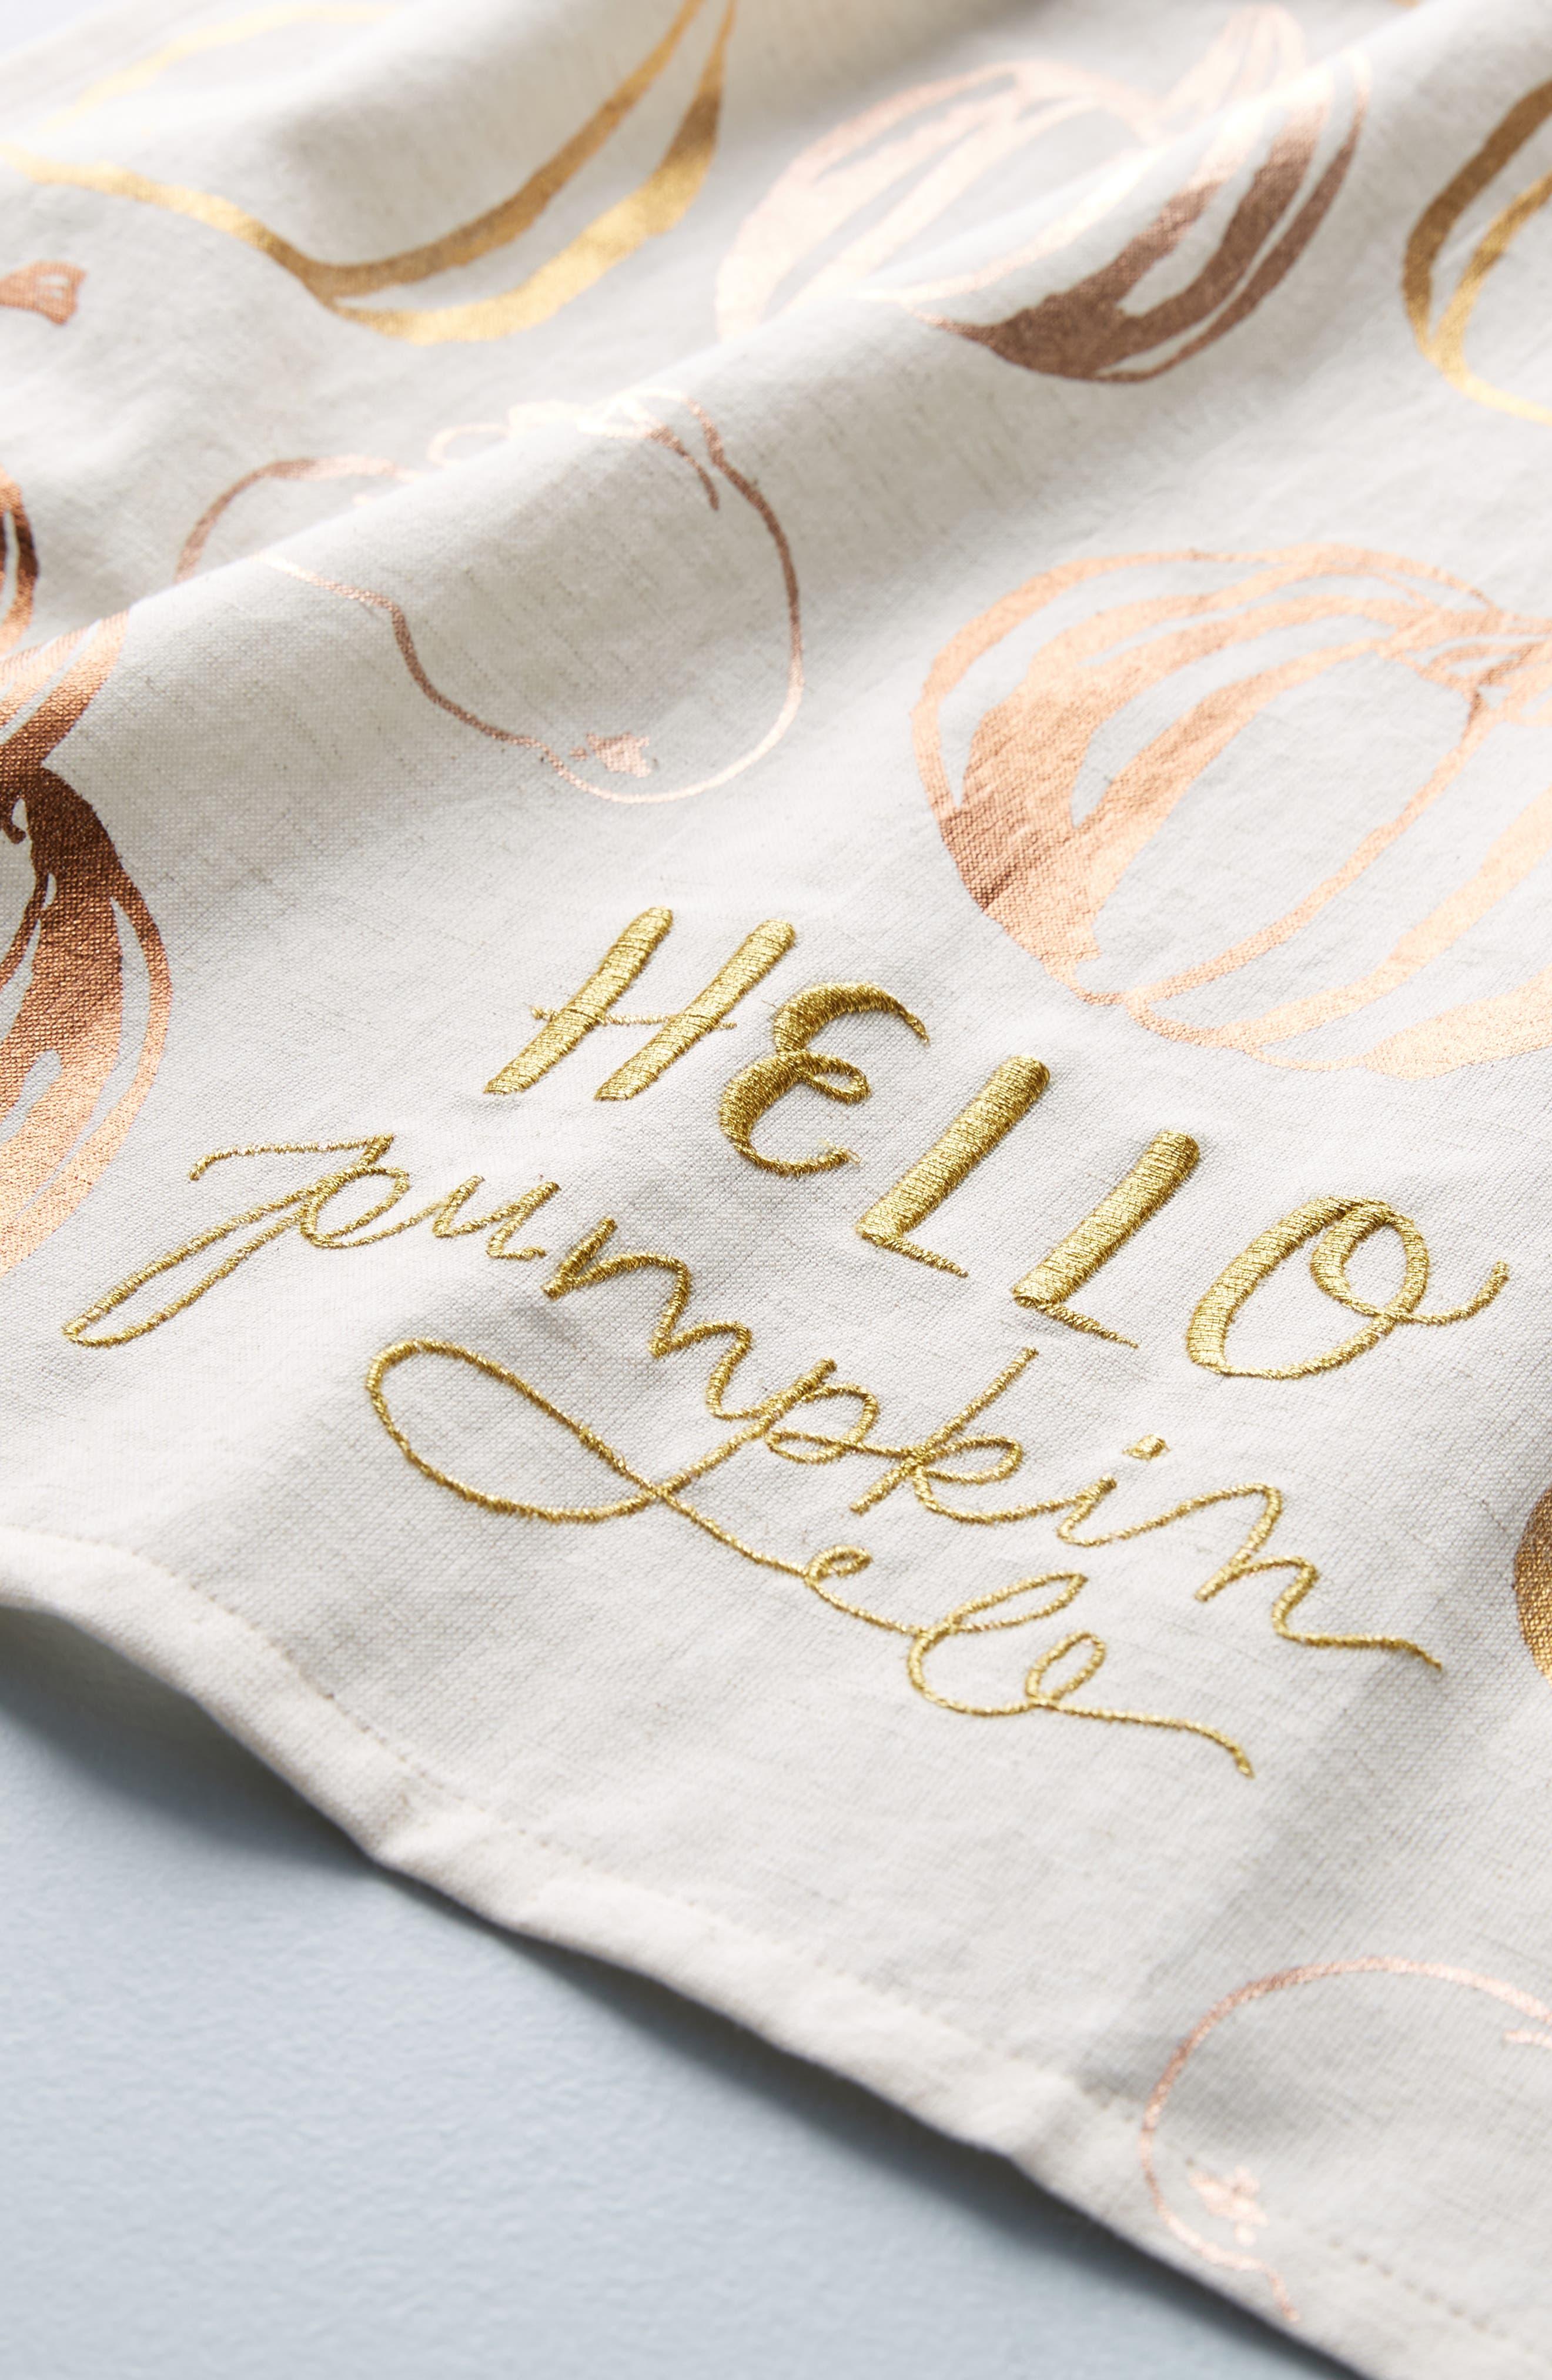 ANTHROPOLOGIE,                             Jasmine Jones Pumpkin Dishtowel,                             Alternate thumbnail 2, color,                             250